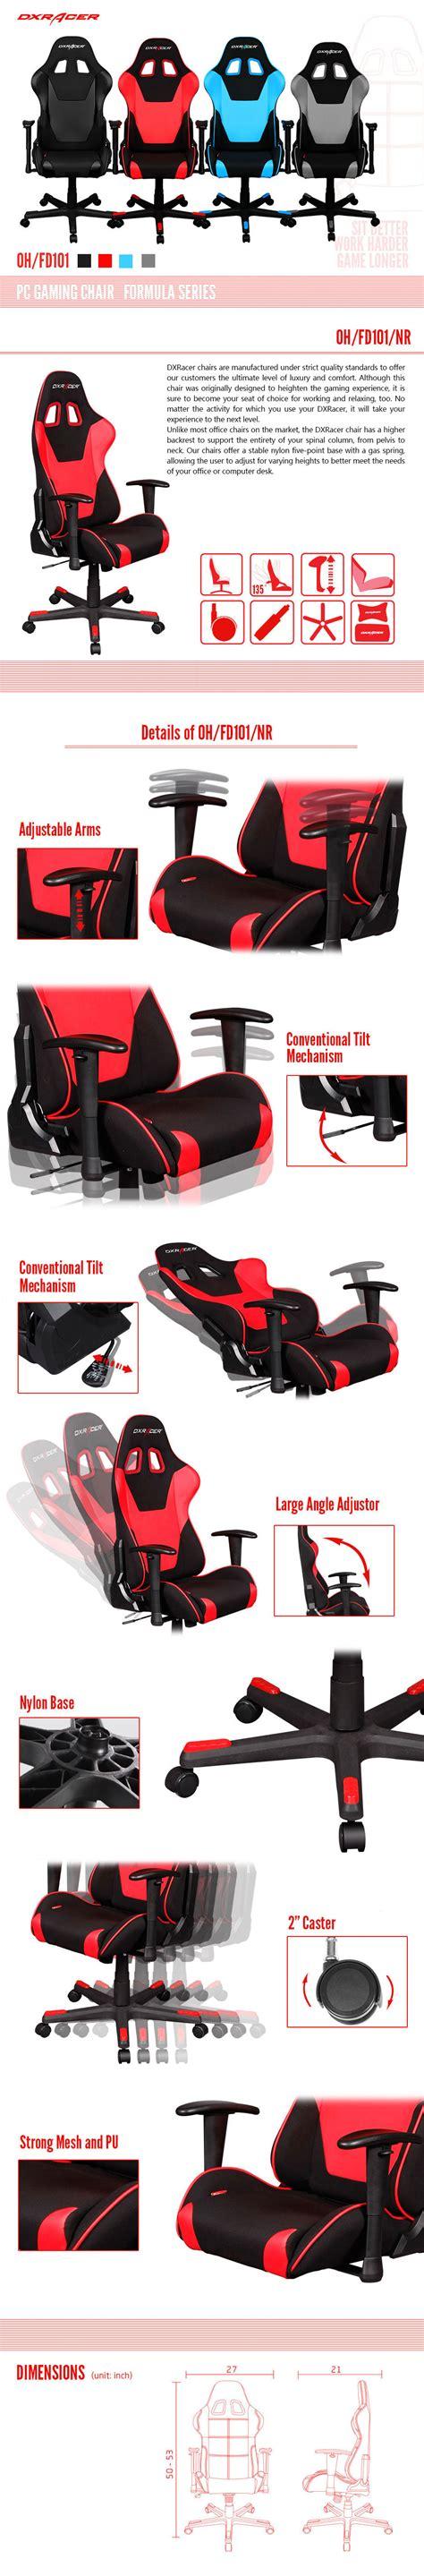 Dxracer Origin Series Ohoc168ne Black Green dxracer formula series gaming chair black oh fd101